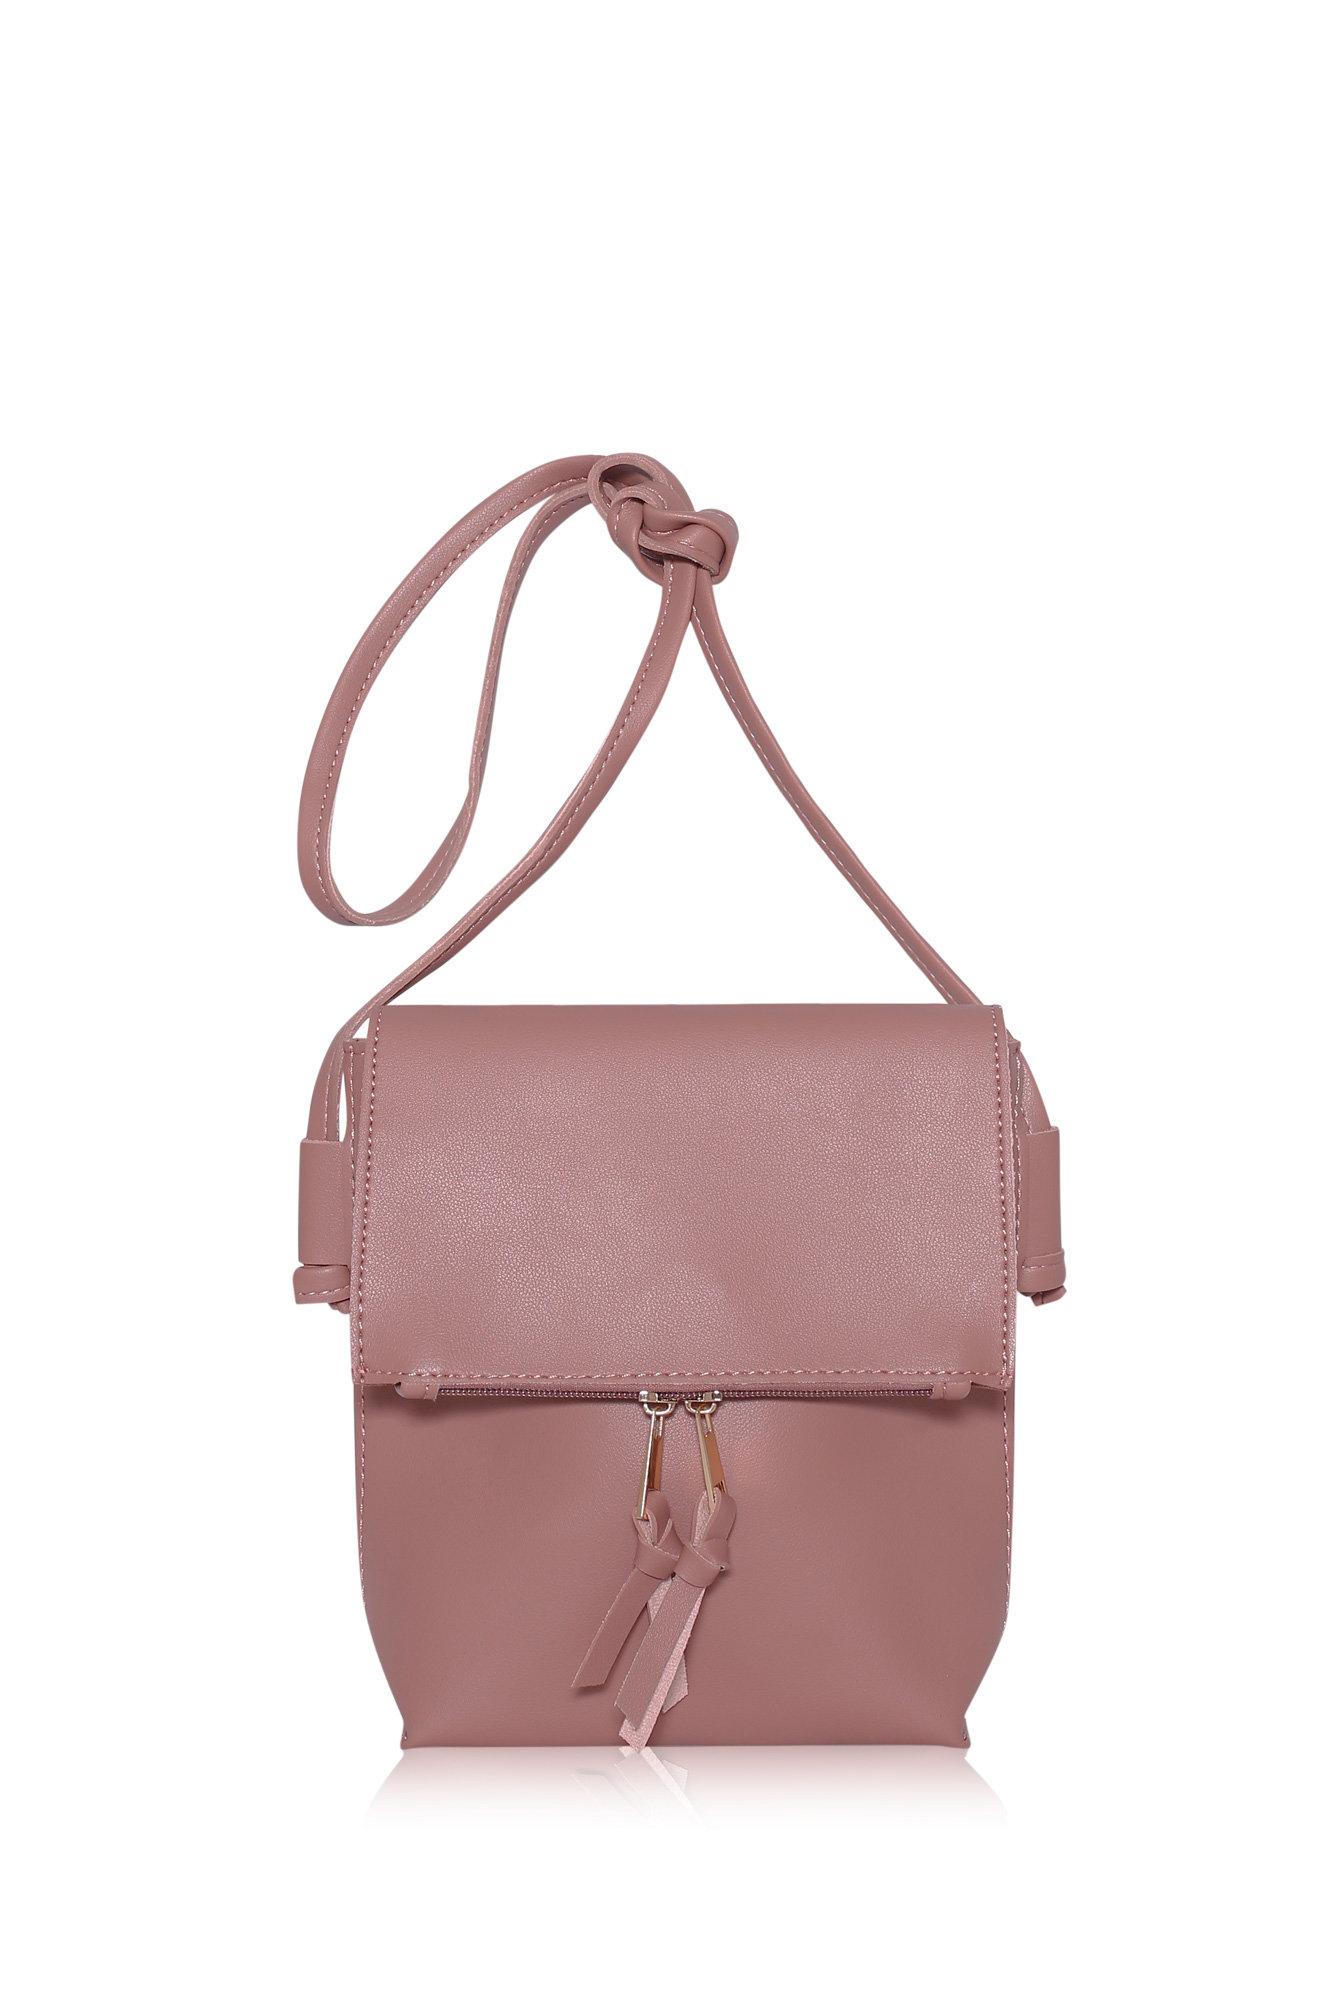 48dd9e2b9f09 Женские сумки оптом | Женская сумка через плечо модель: MARSO ...